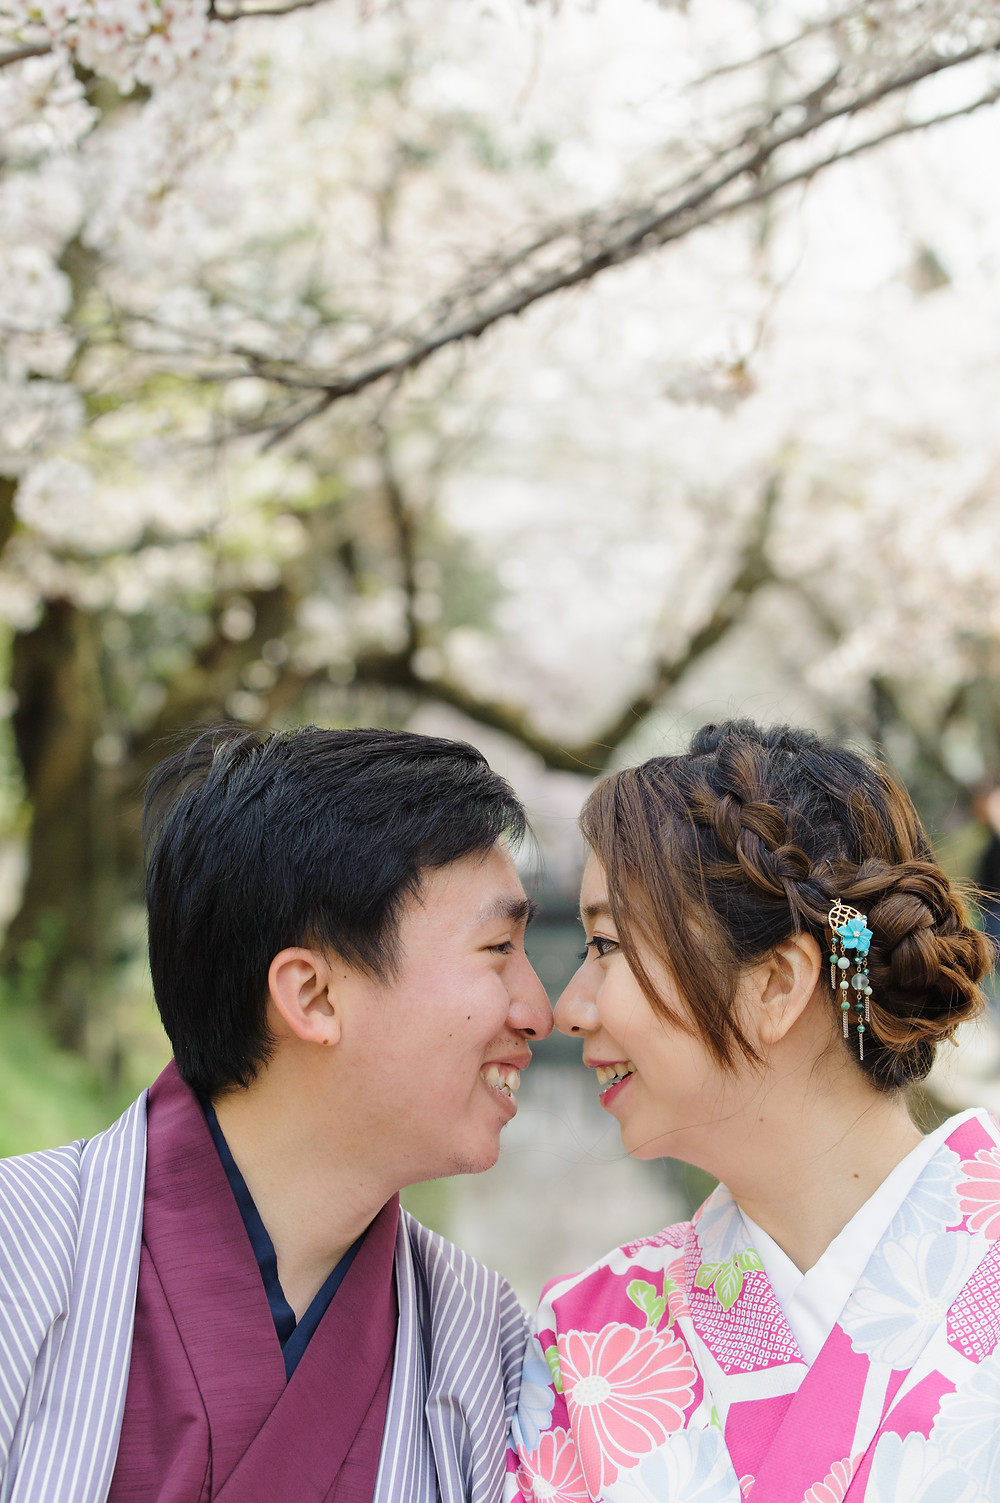 Close up portrait under the sakura